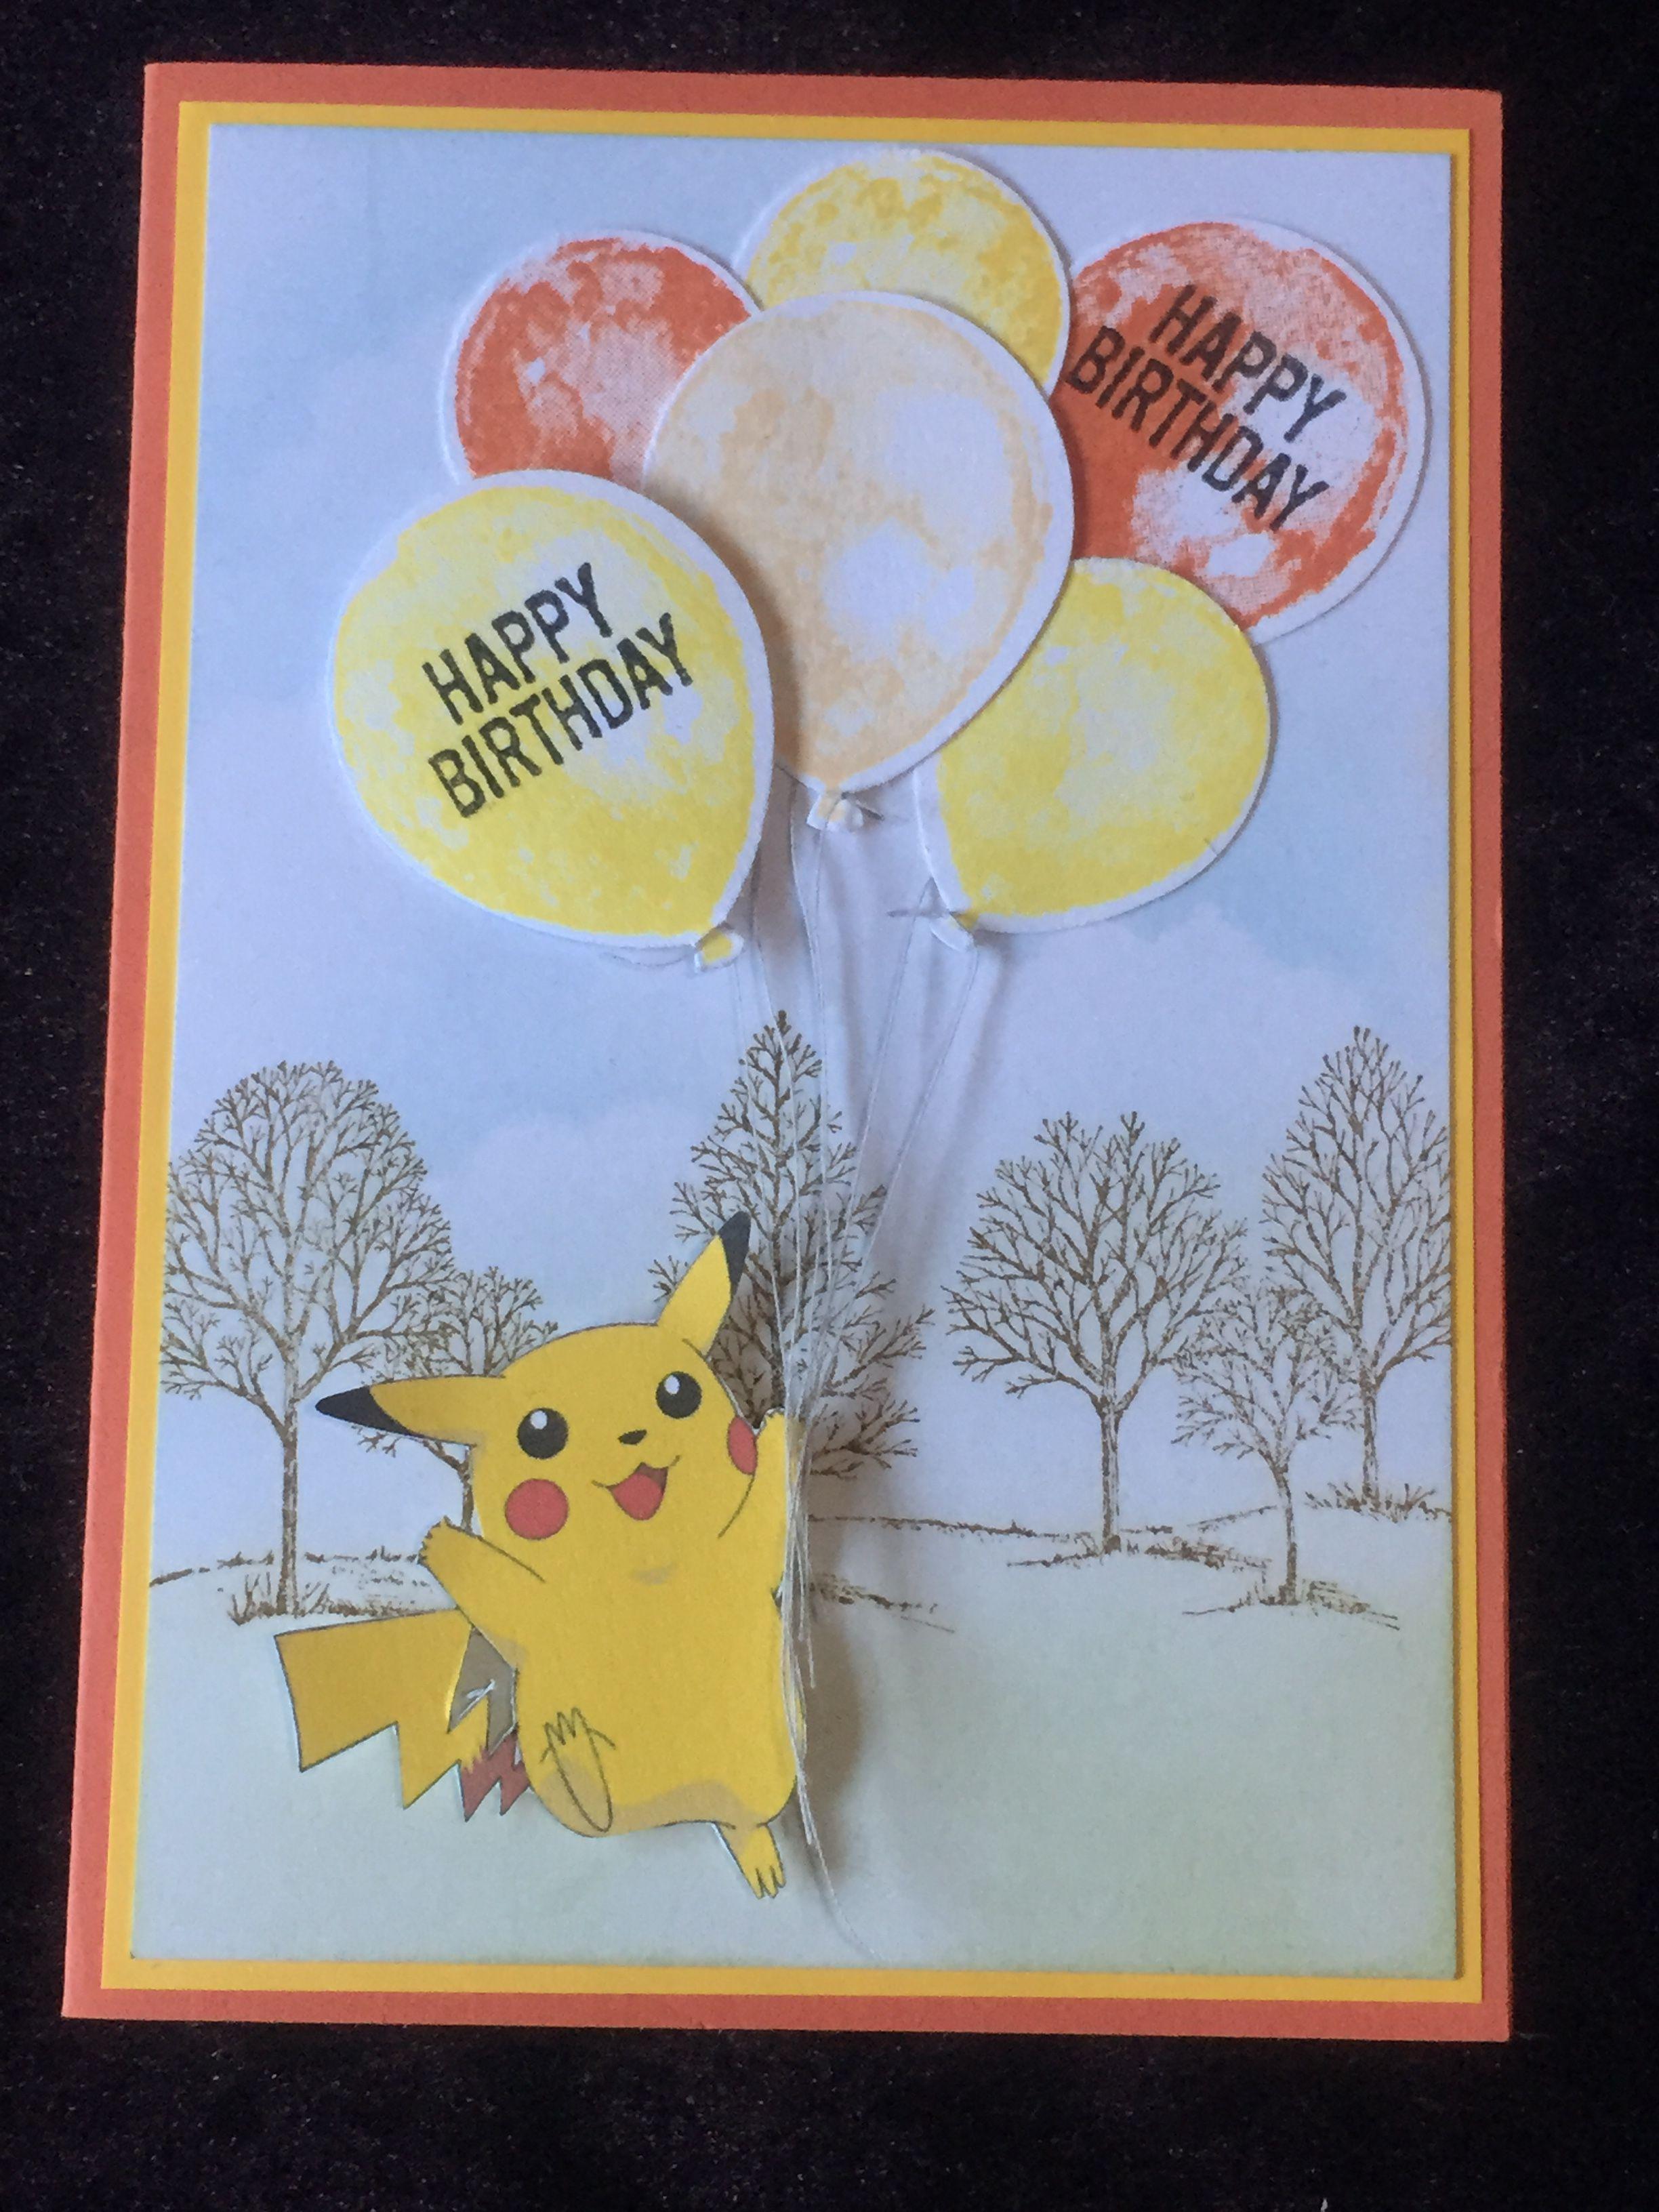 Pokemon Theme Birthday Card Happy Birthday Lovely As A Tree Balloon Builder Sponged Background C Birthday Cards Diy Card Making Kids Pokemon Birthday Card